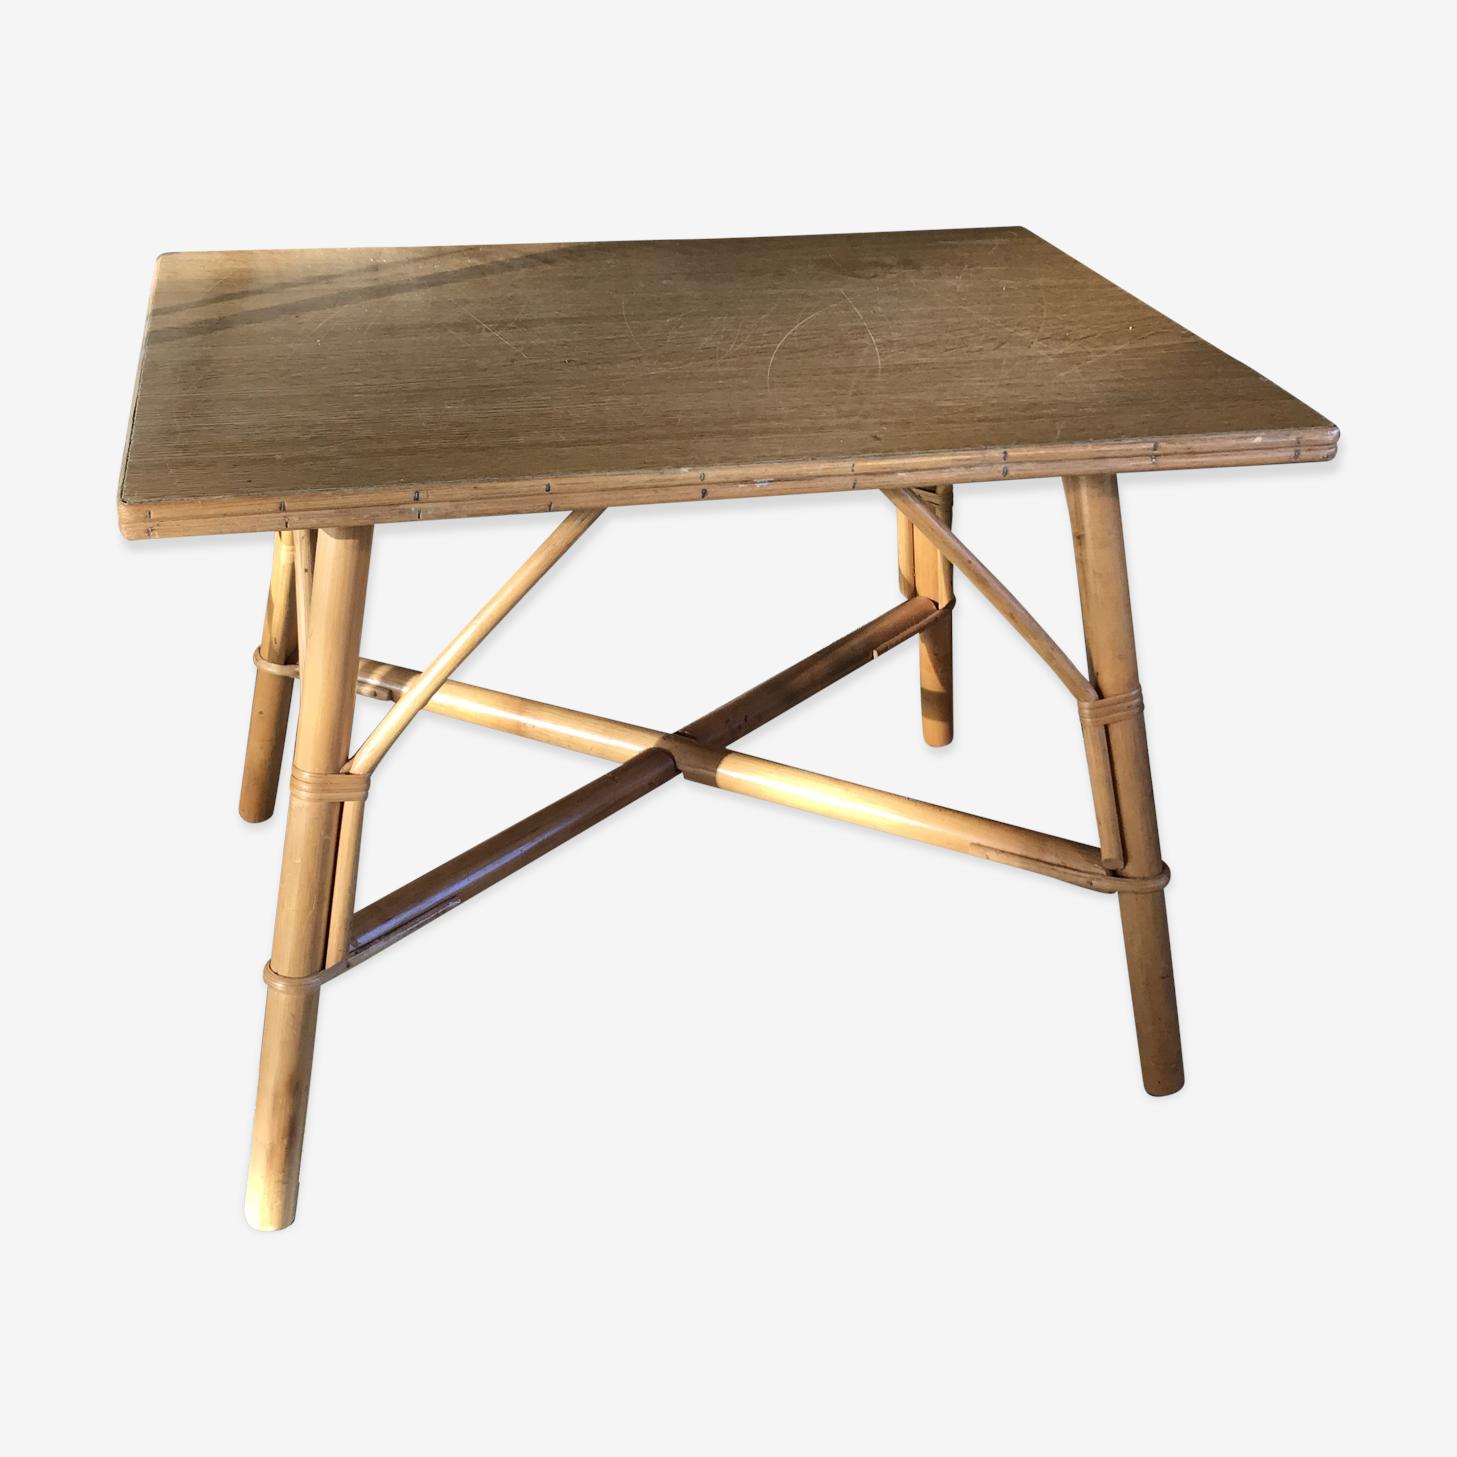 Vintage rattan rectangular coffee table